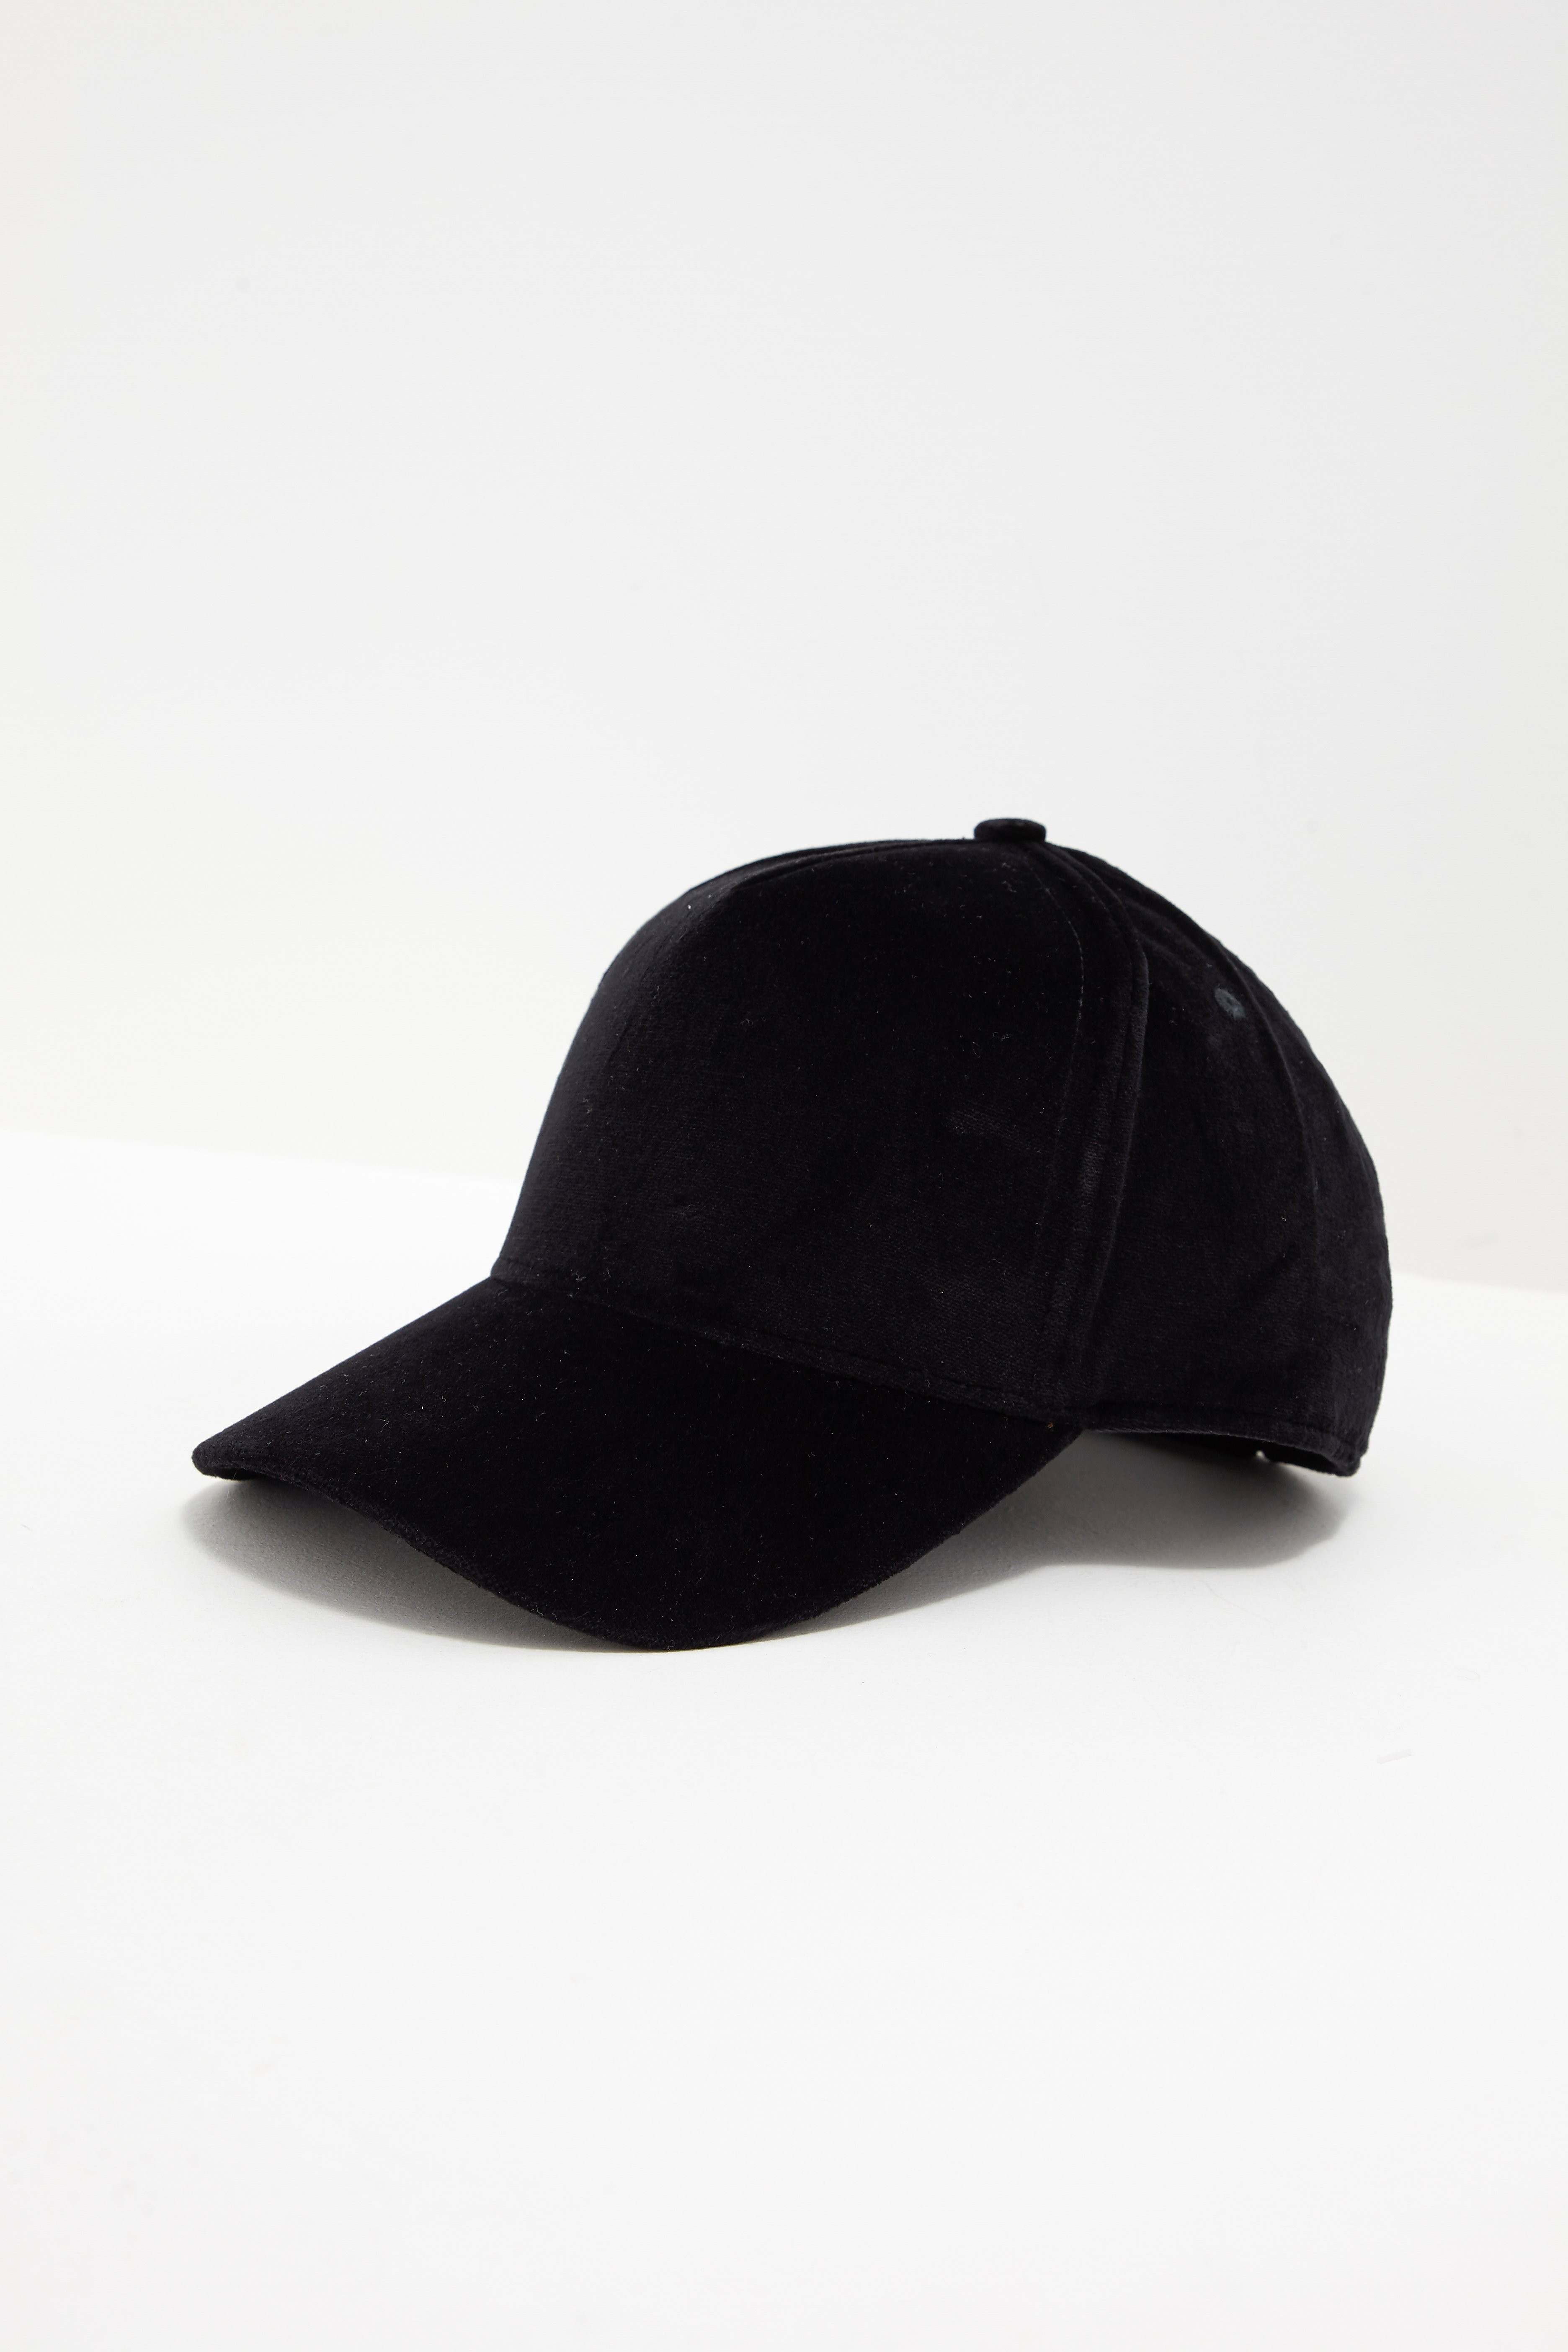 Represent Velour Trucker Cap